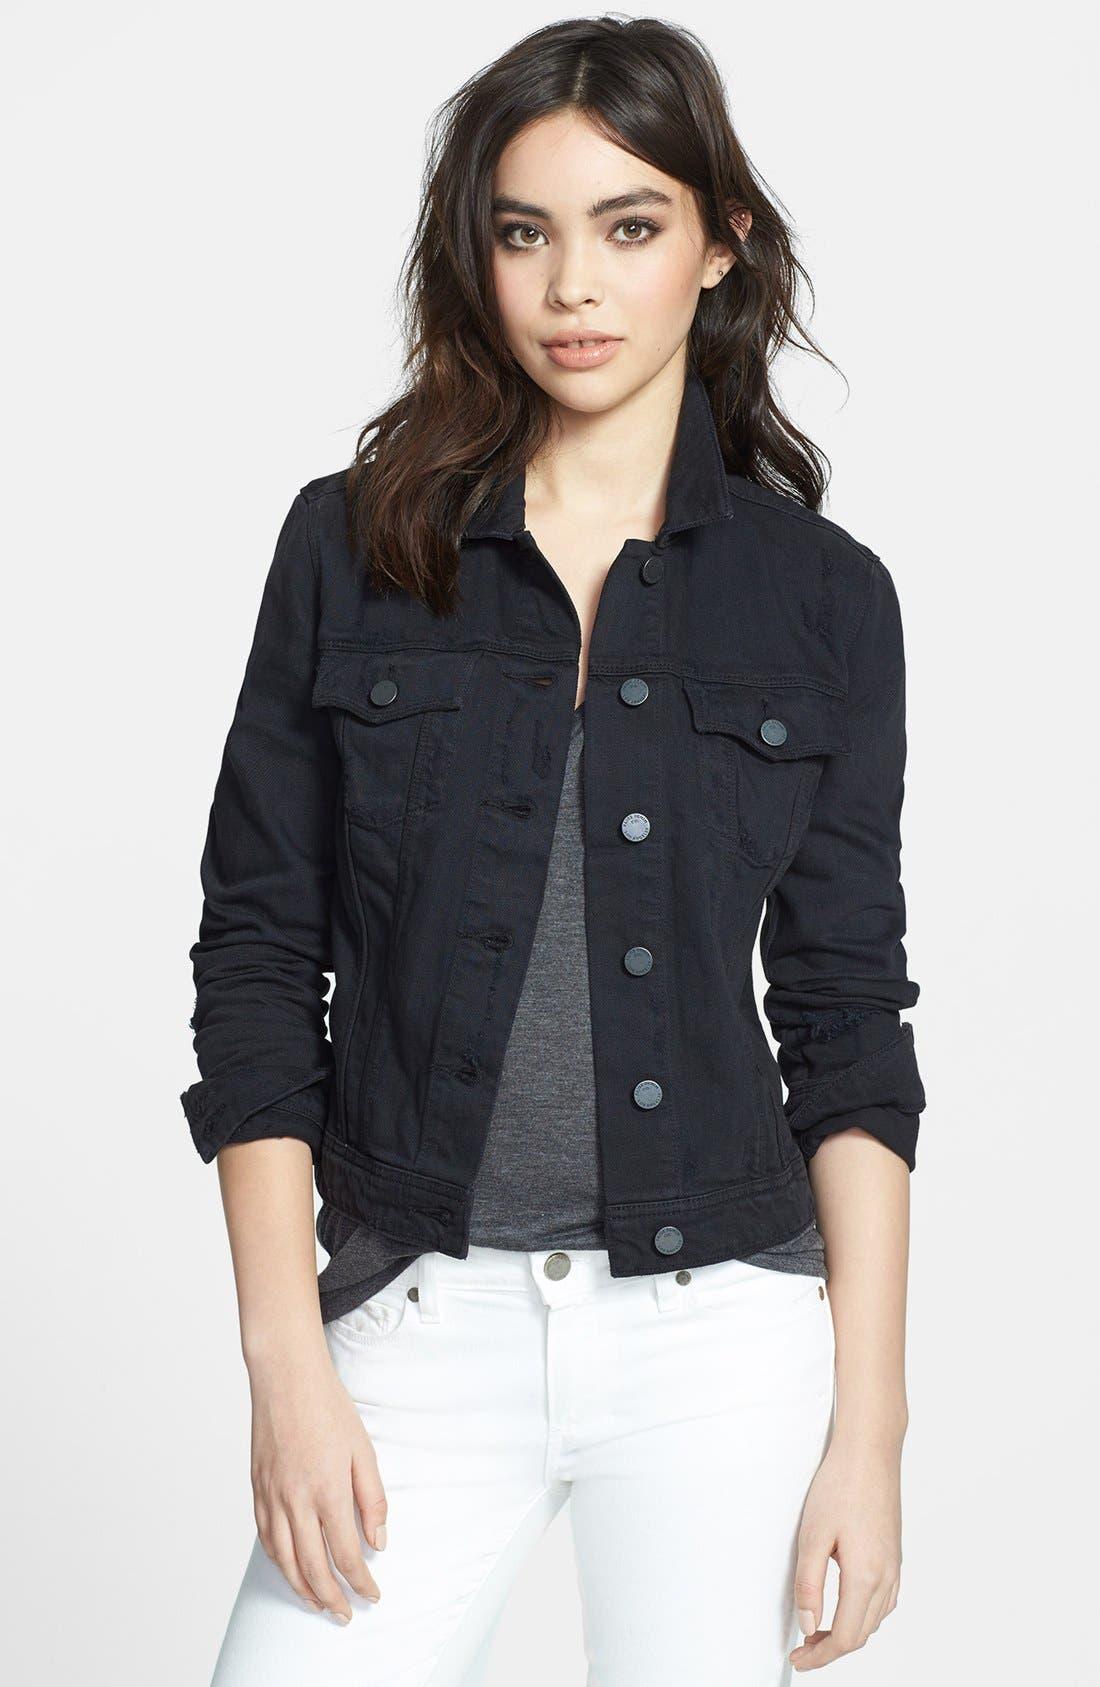 Alternate Image 1 Selected - Paige Denim 'Vermont' Distressed Denim Jacket (Vintage Black)